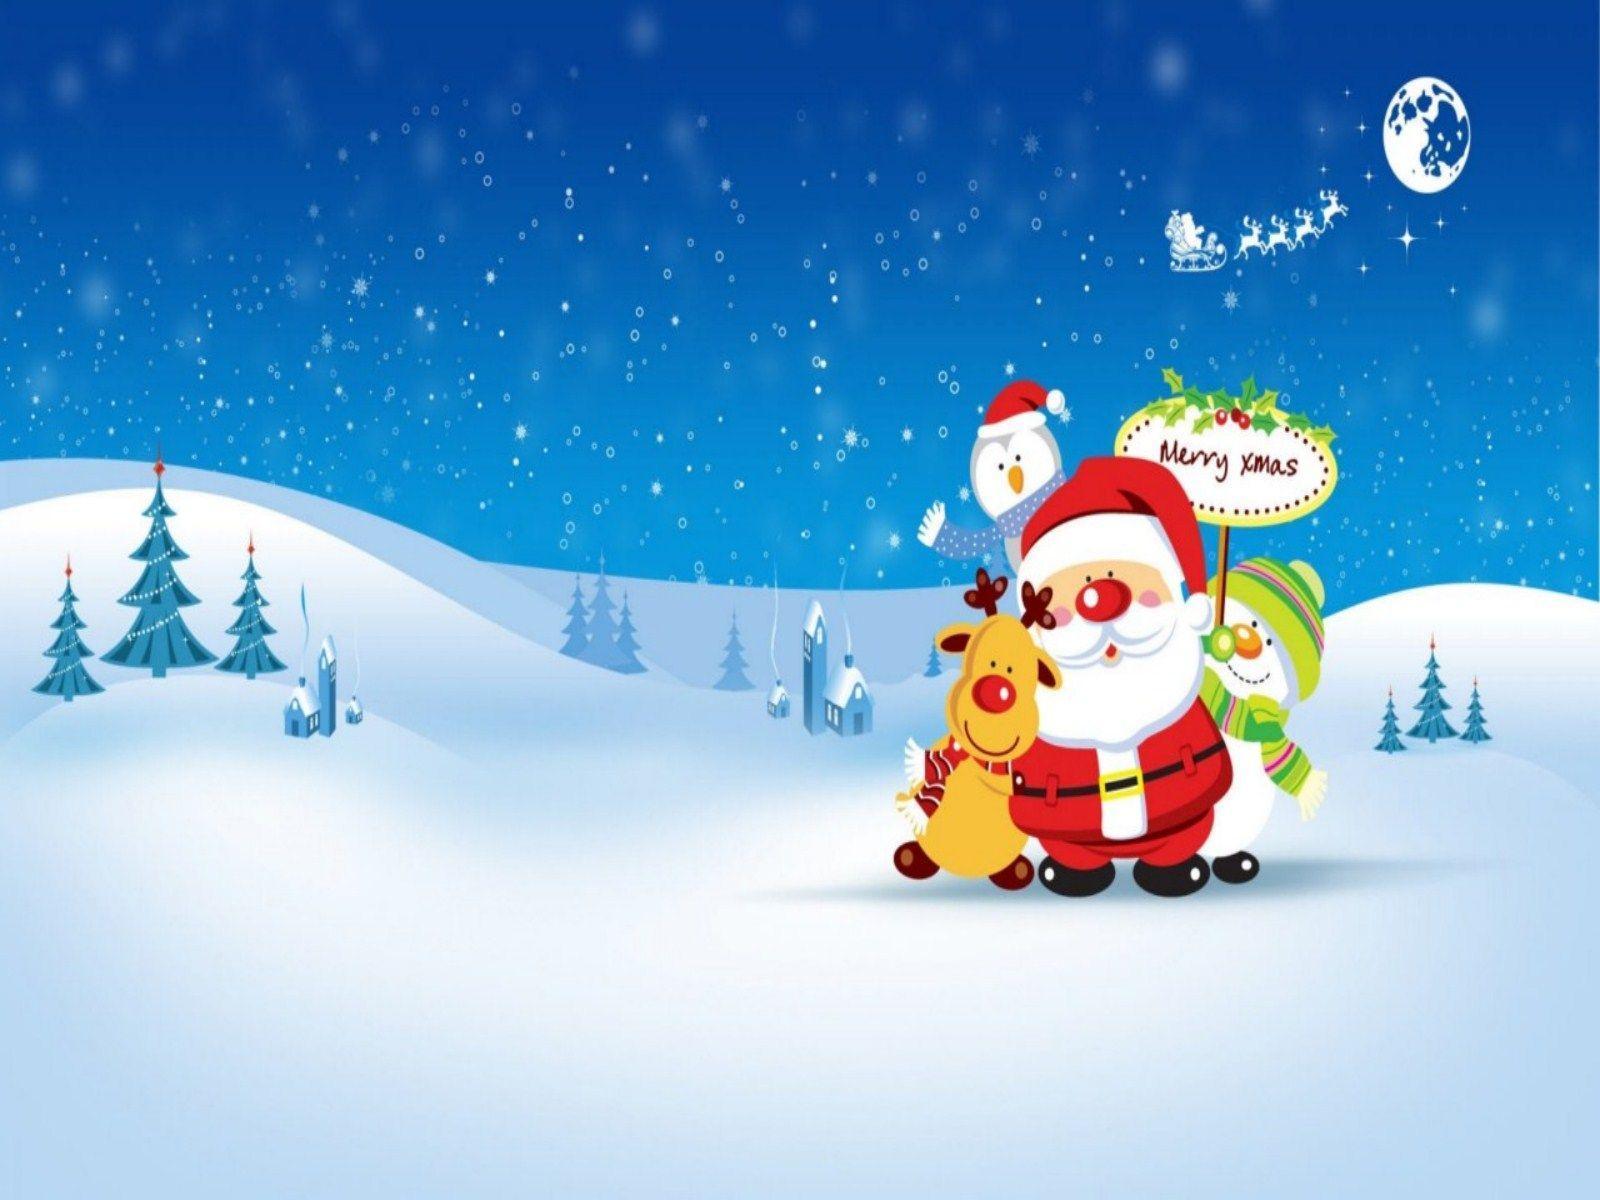 Christmas Desktop Pictures.Funny Christmas Desktop Backgrounds Wallpaper Cave